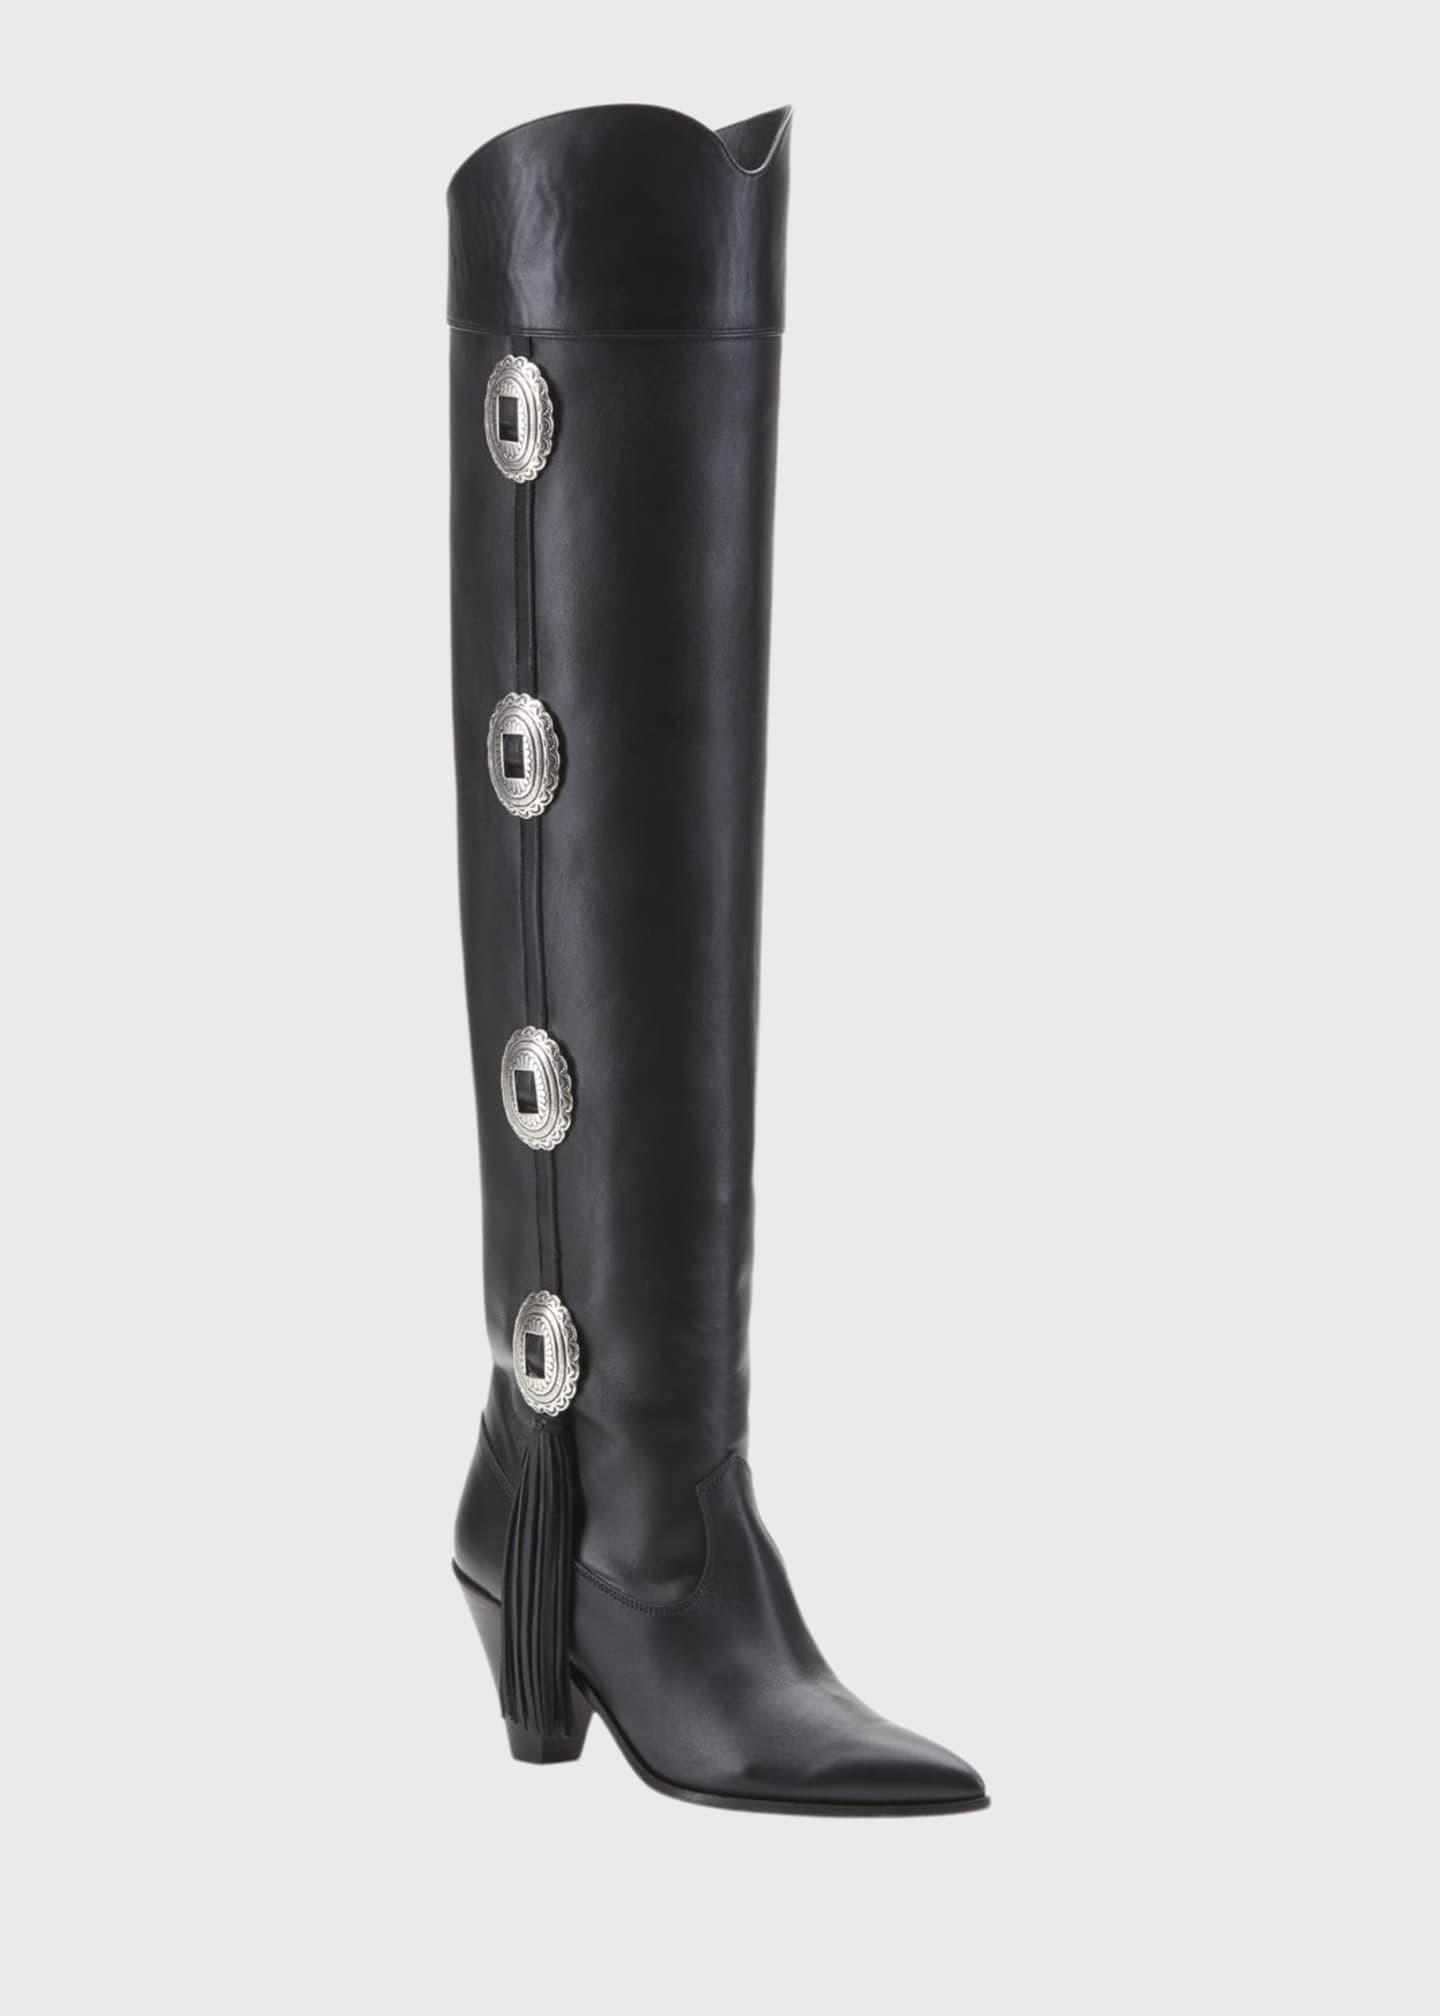 Aquazzura Go West Concho Fringe Knee Boots